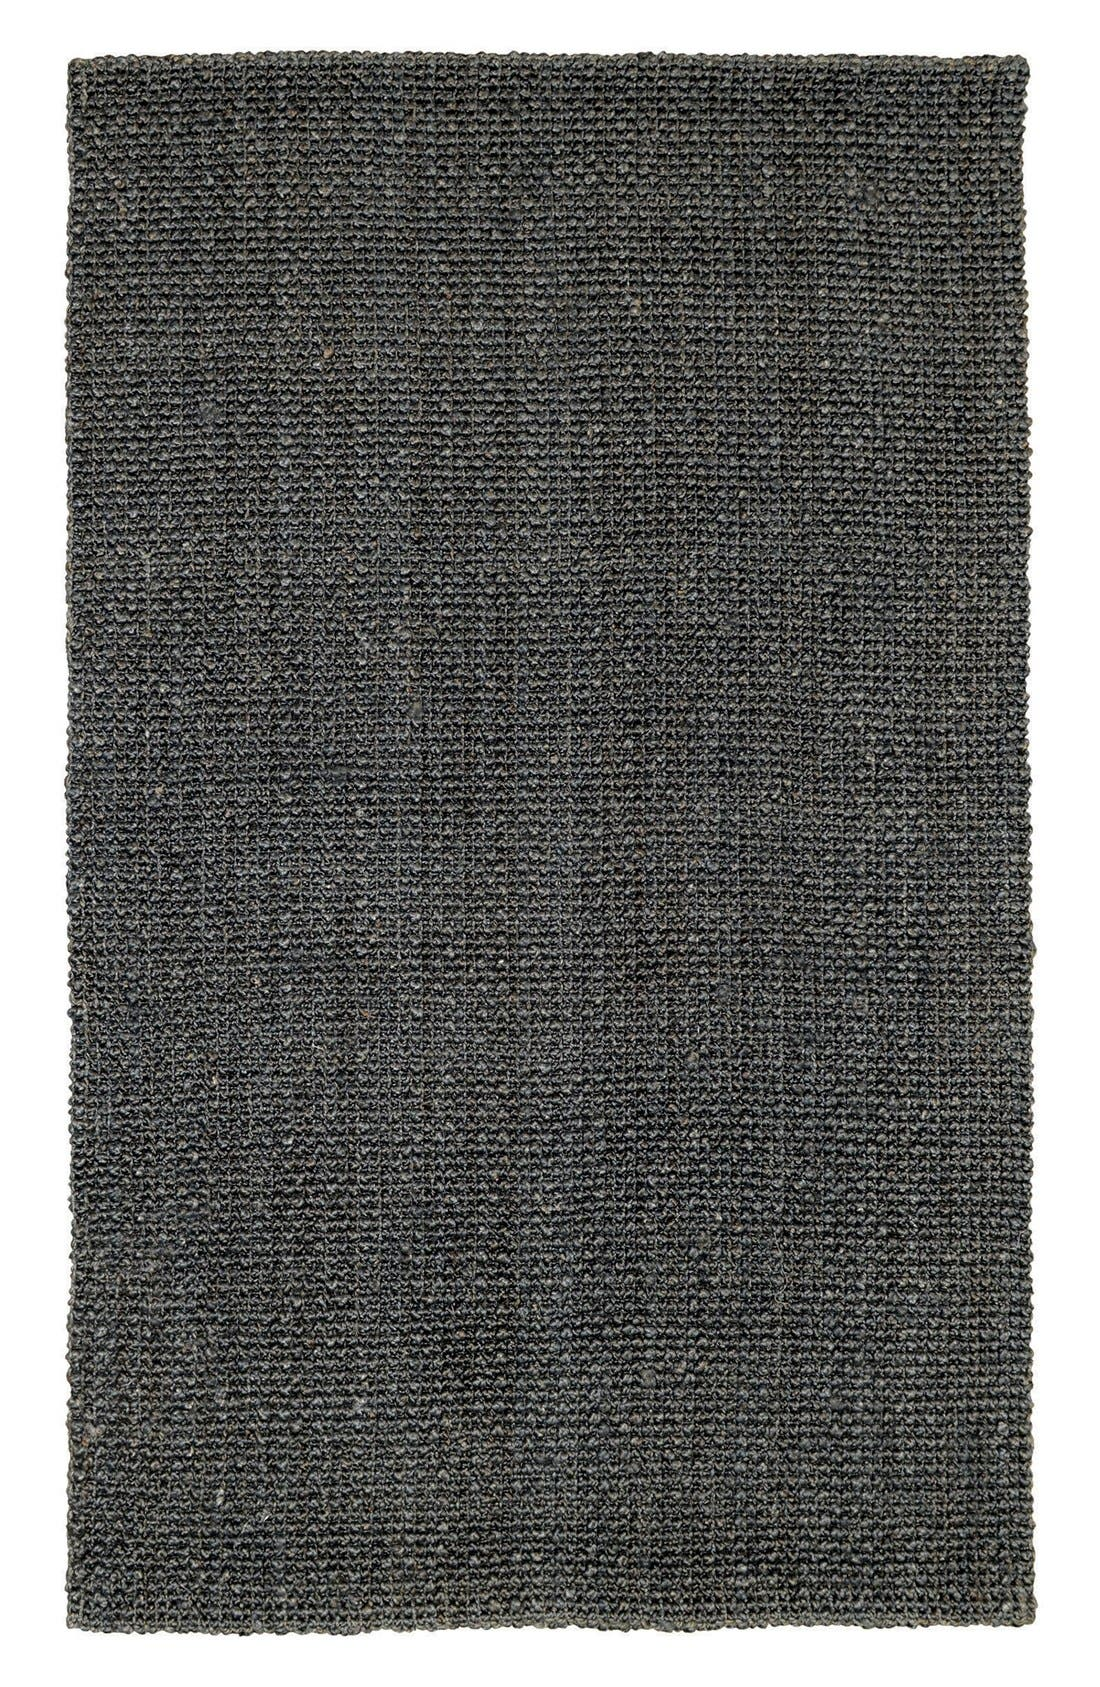 Knobby Loop Handwoven Rug,                             Main thumbnail 1, color,                             001